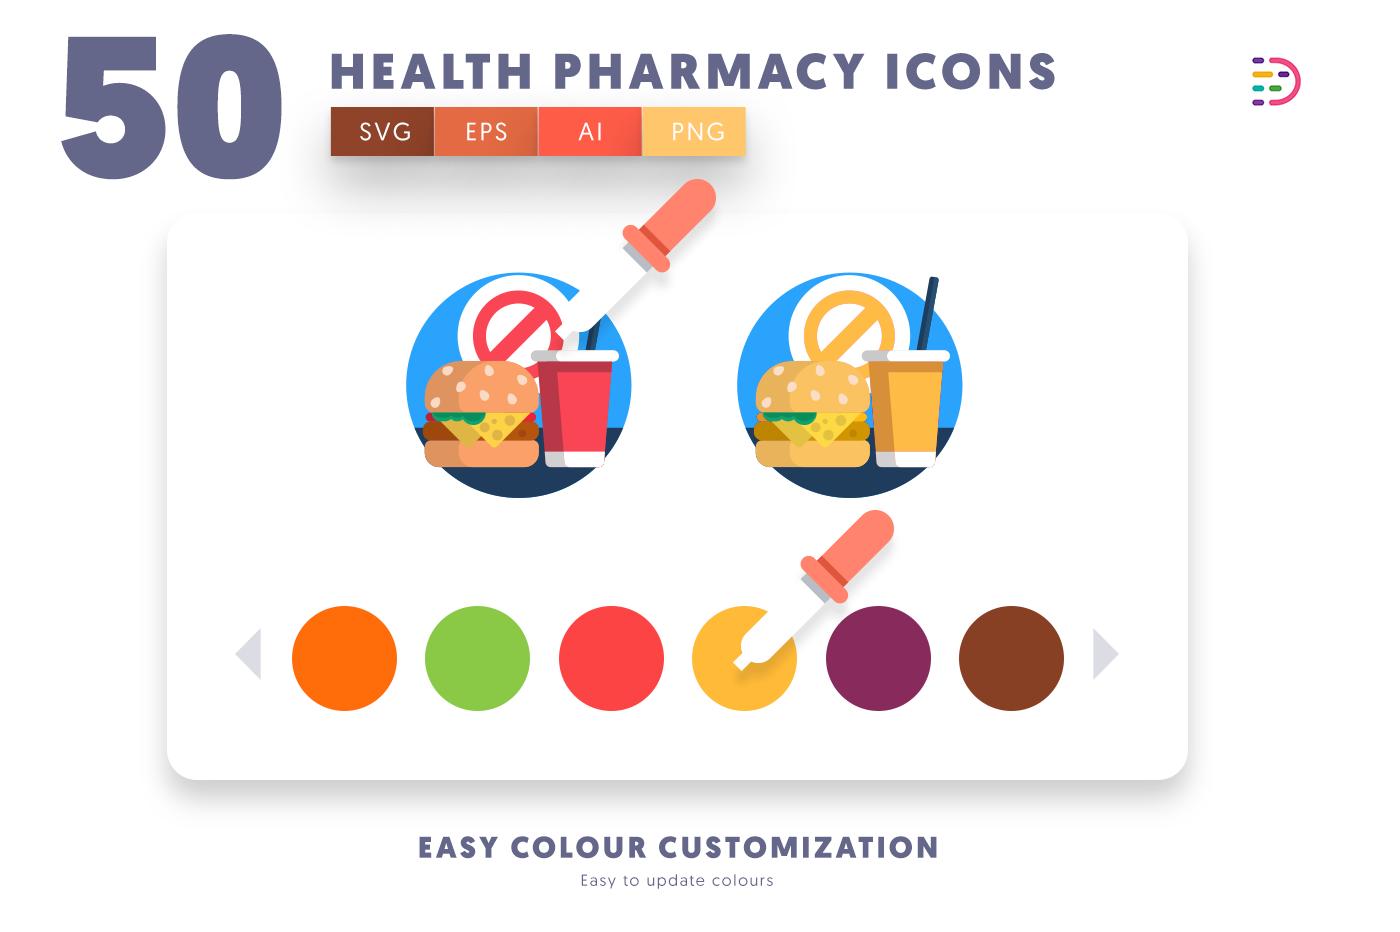 EPS, SVG, PNG full vector 50 Health Pharmacy Icons